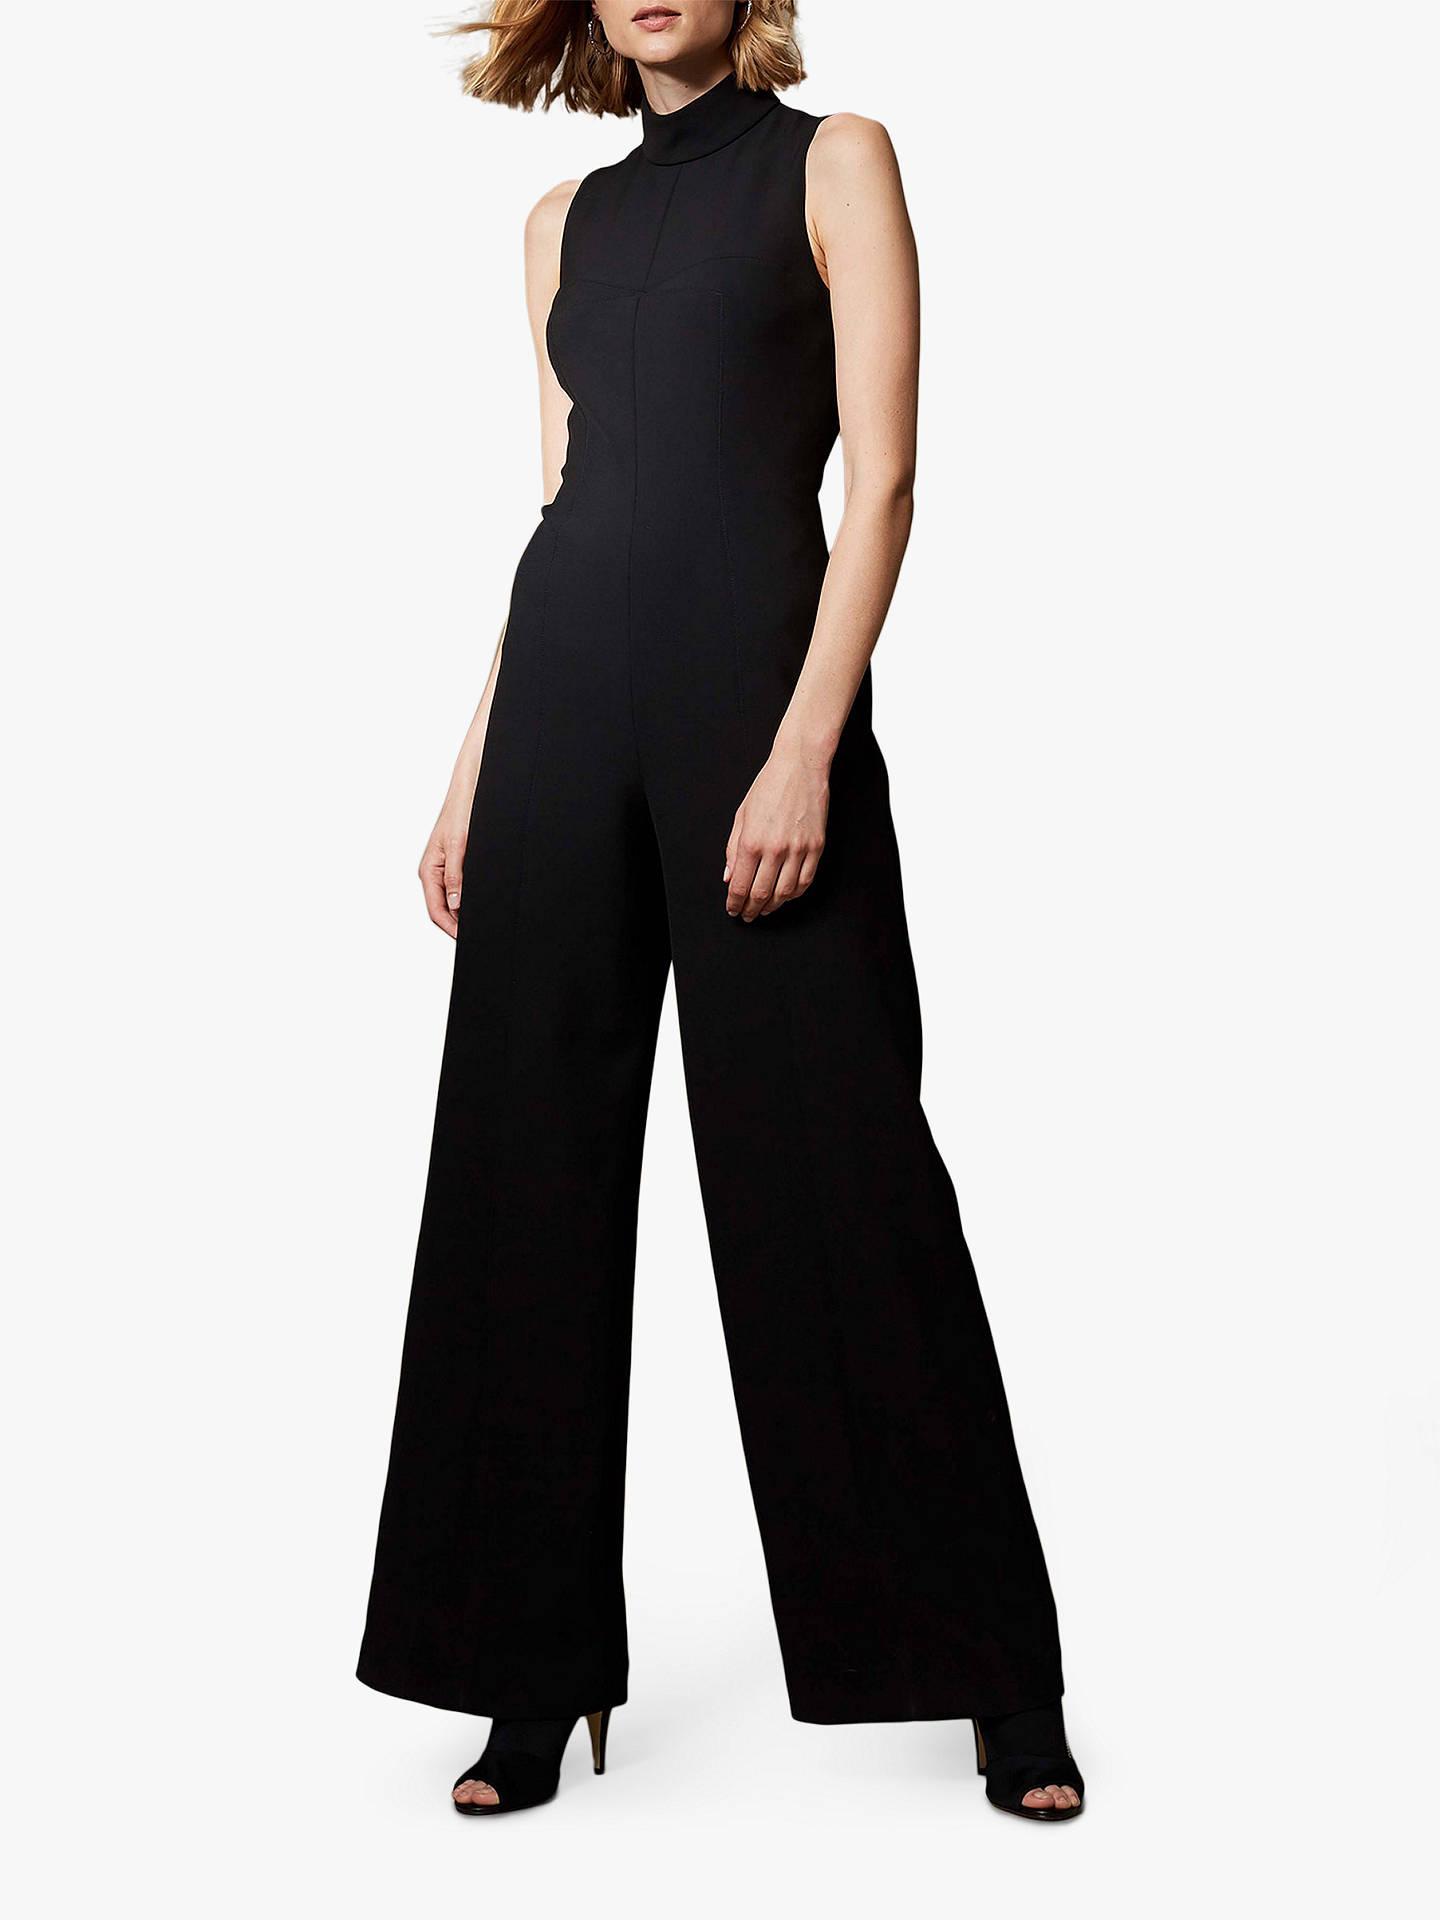 5f3e7abdb01b Buy Karen Millen Wide Leg Jumpsuit